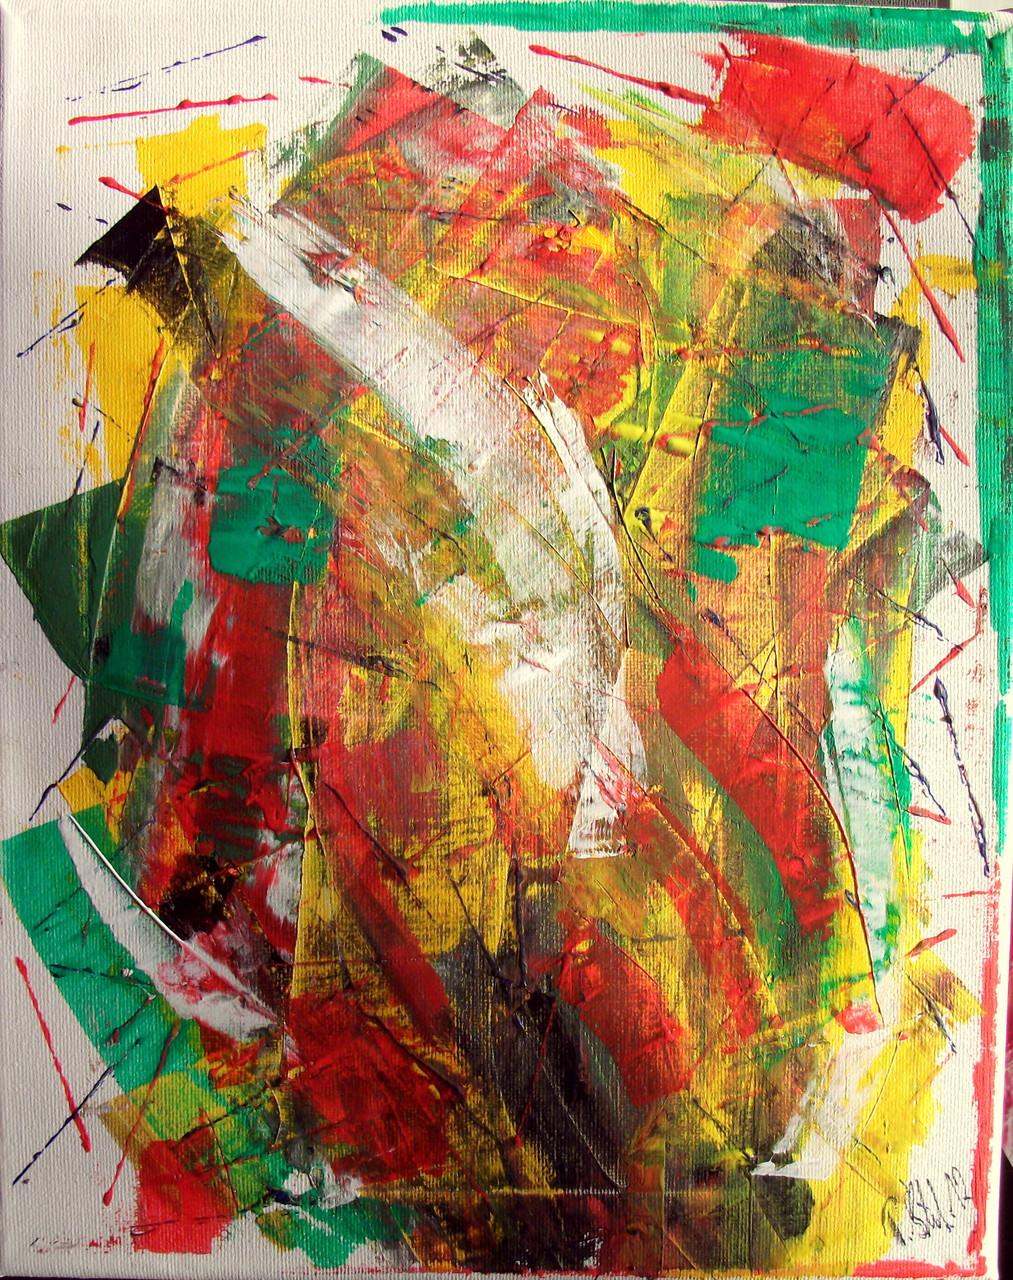 Abstrakte Welten 2 (24 x 30) Acryl auf Leinwand Kaufpreis 30 €uro